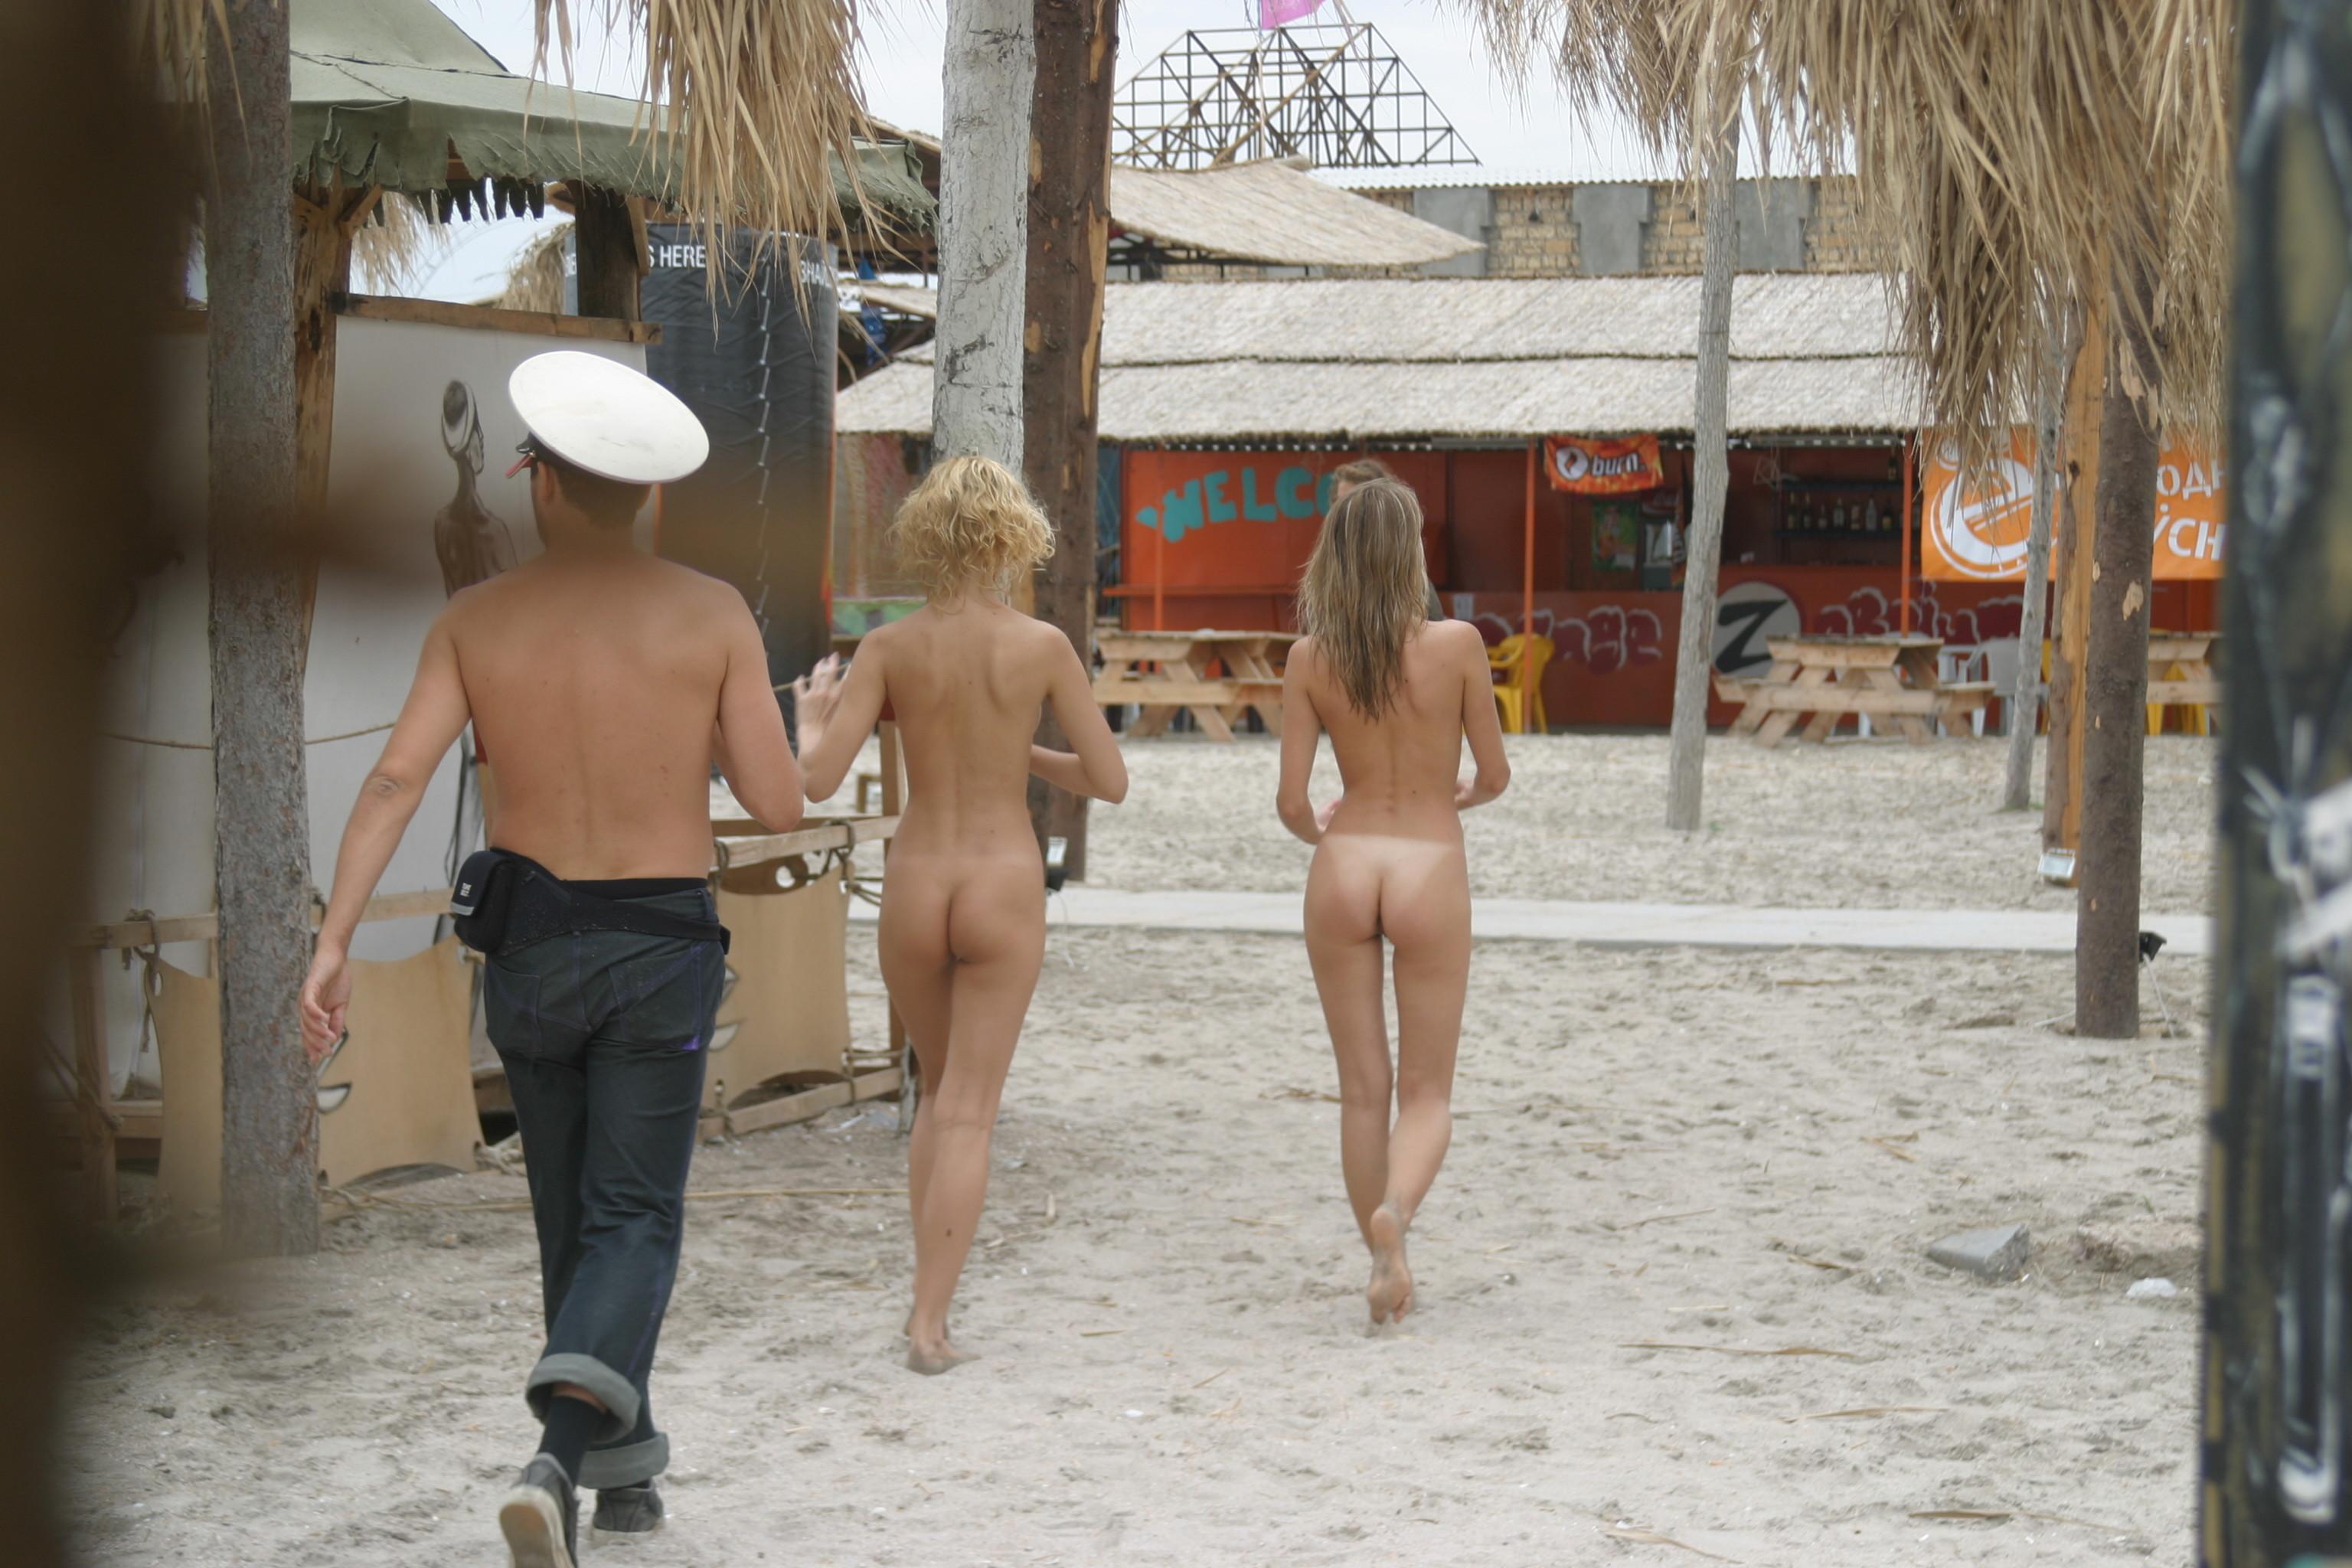 vika-y-lena-l-beach-nude-in-public-metart-09